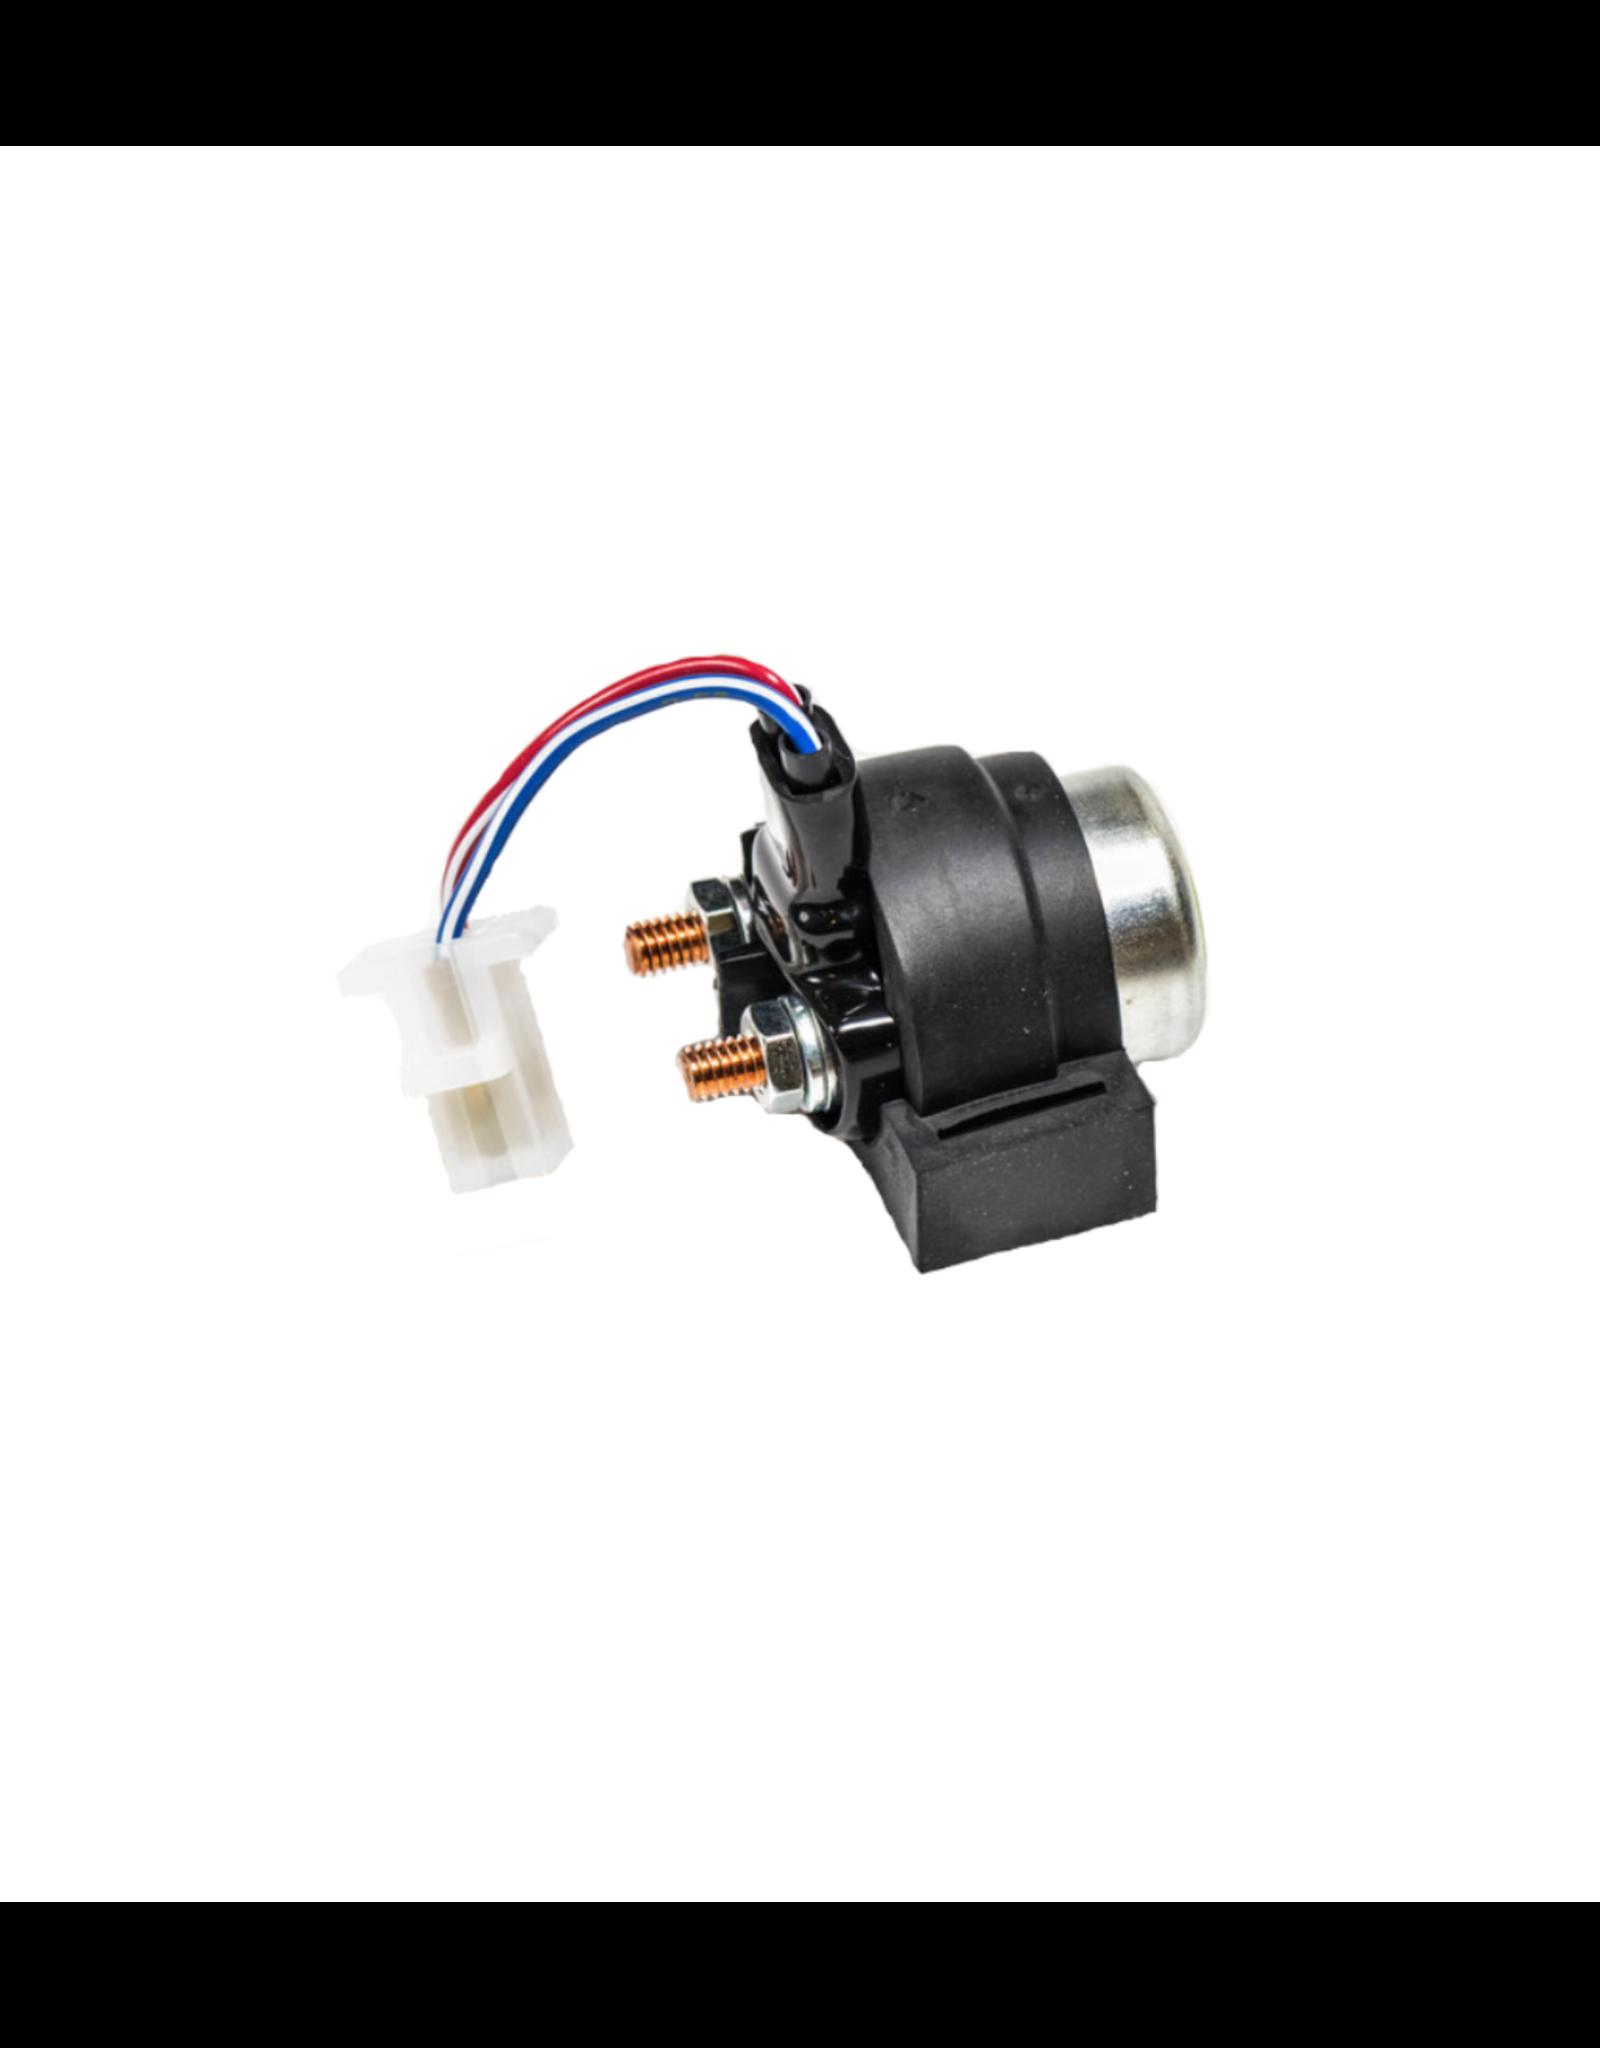 Aprilia Starter Solenoid Upgrade 150 amp (V Twin >06)AP81129275/AP81129276